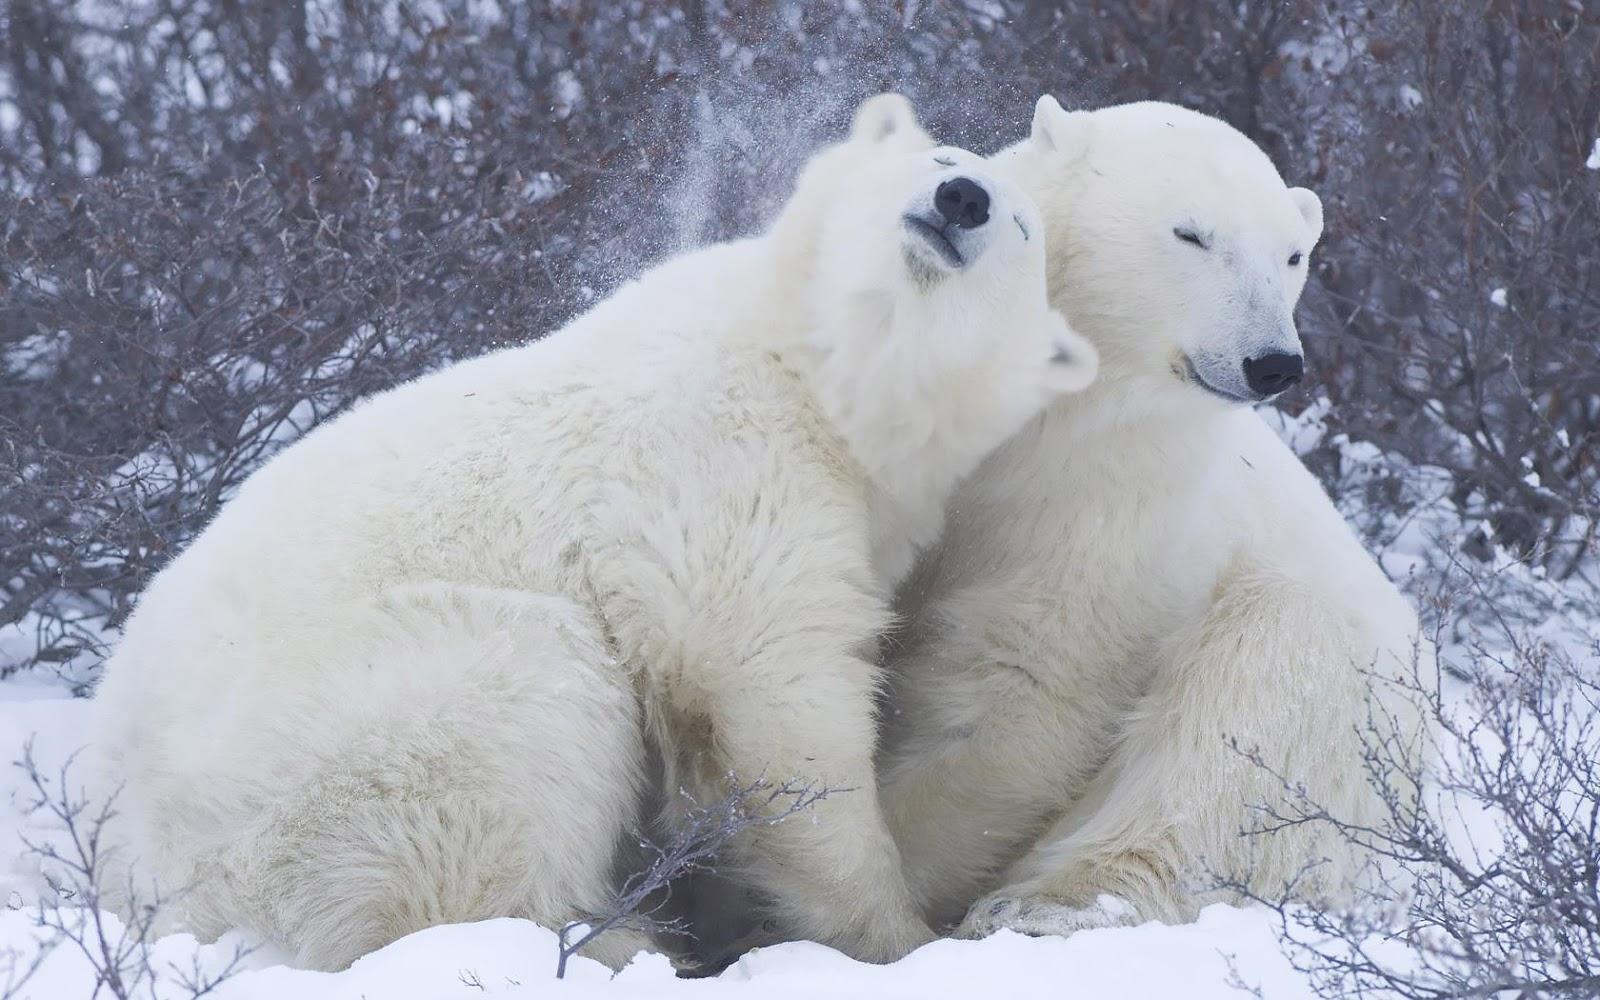 Two Cuddling Polar Bears Wallpaper